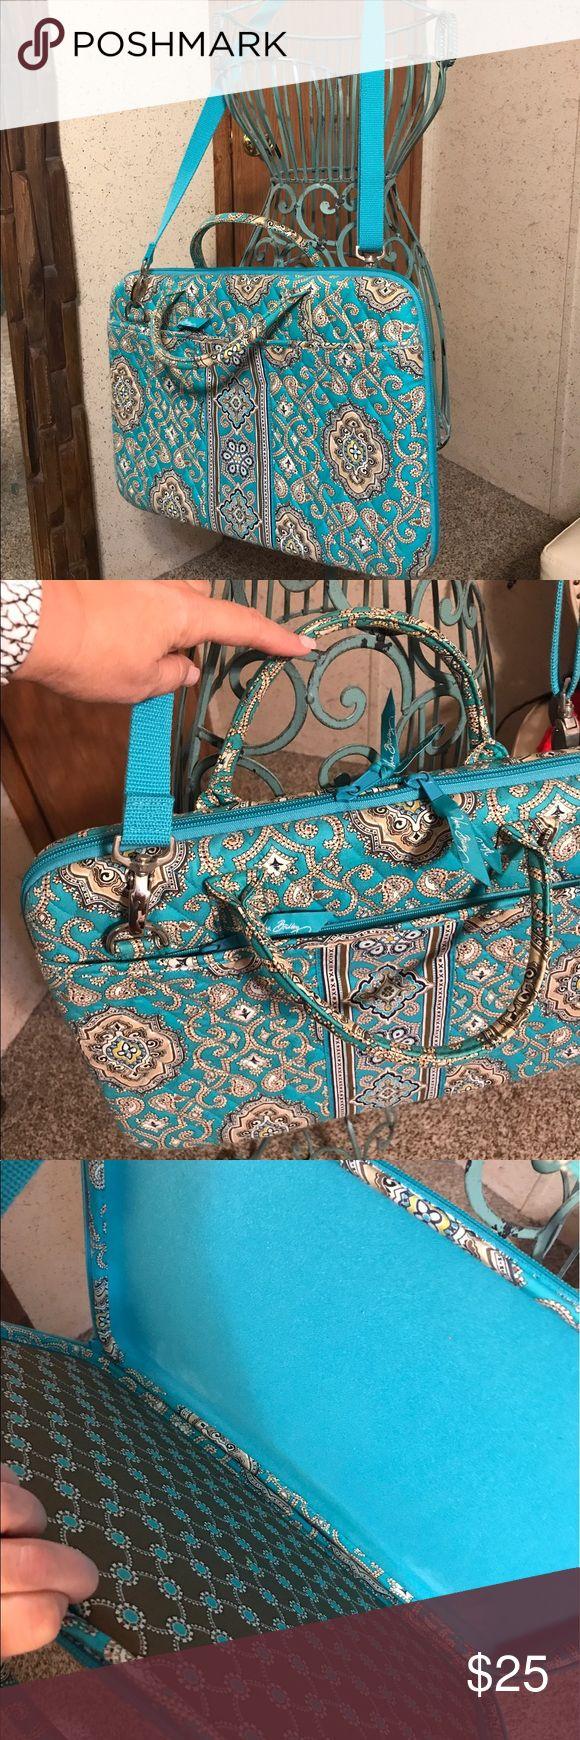 Vera Bradley laptop case Vera Bradley laptop case Vera Bradley Bags Travel Bags